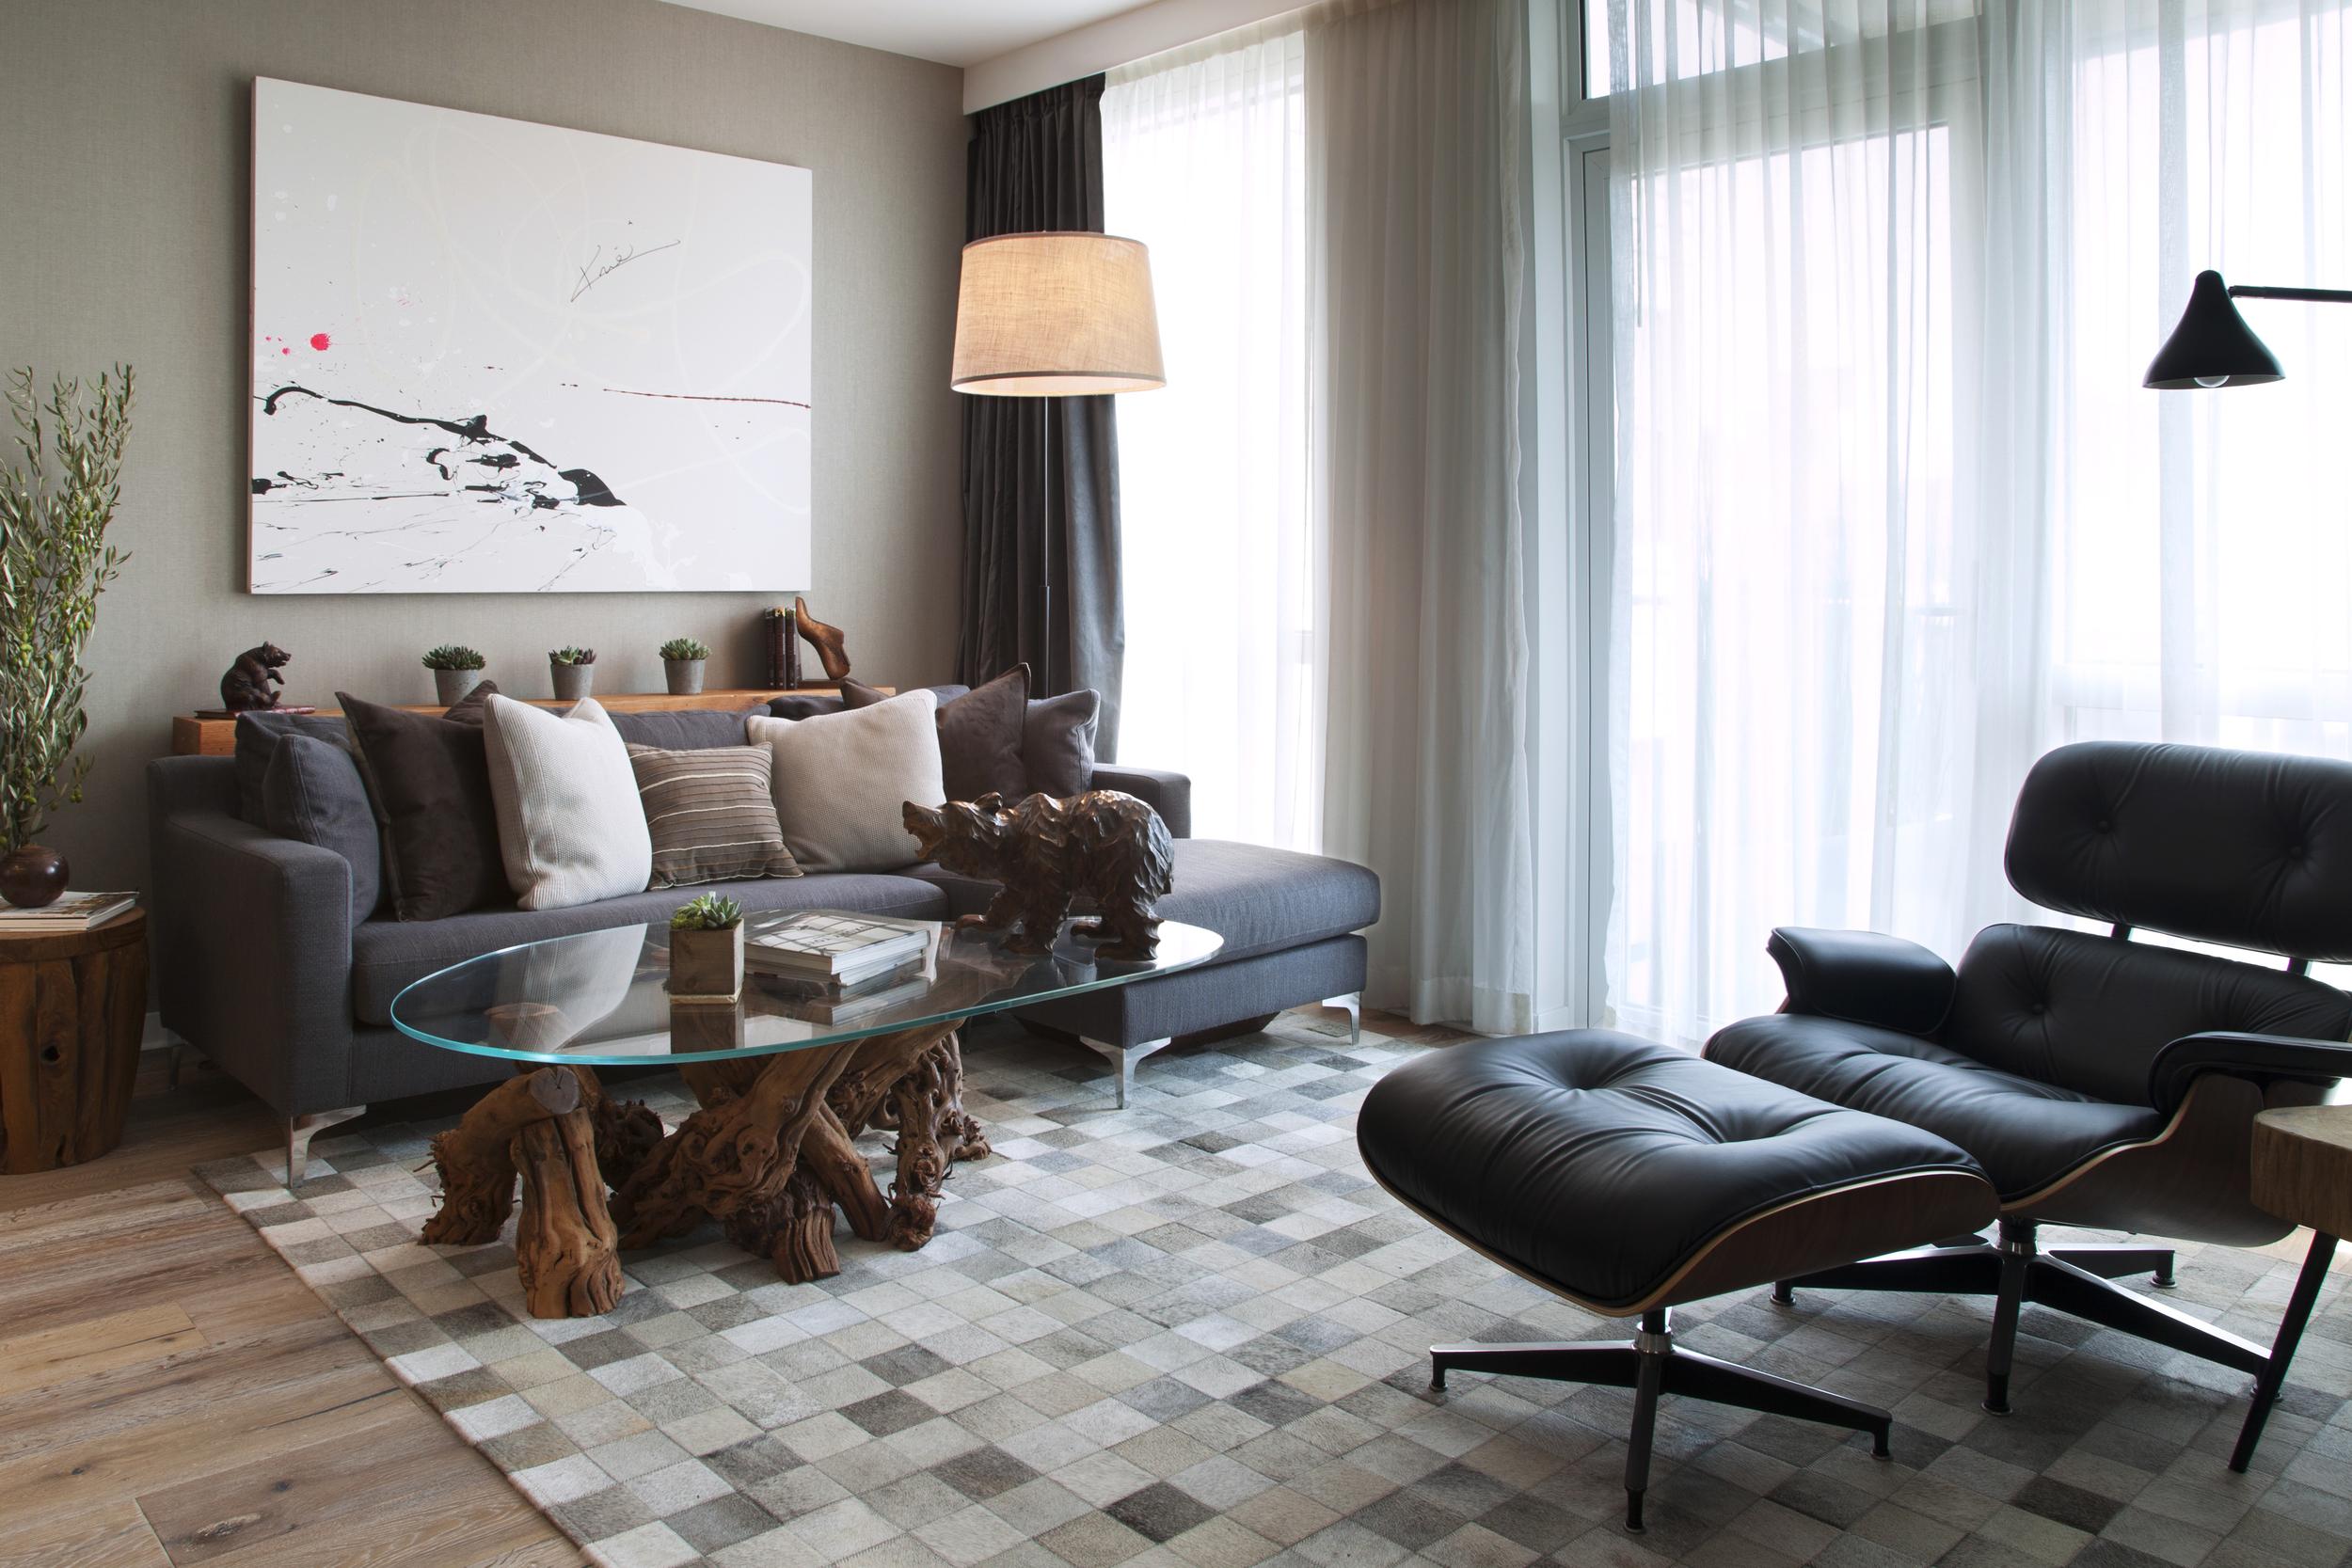 San francisco living room